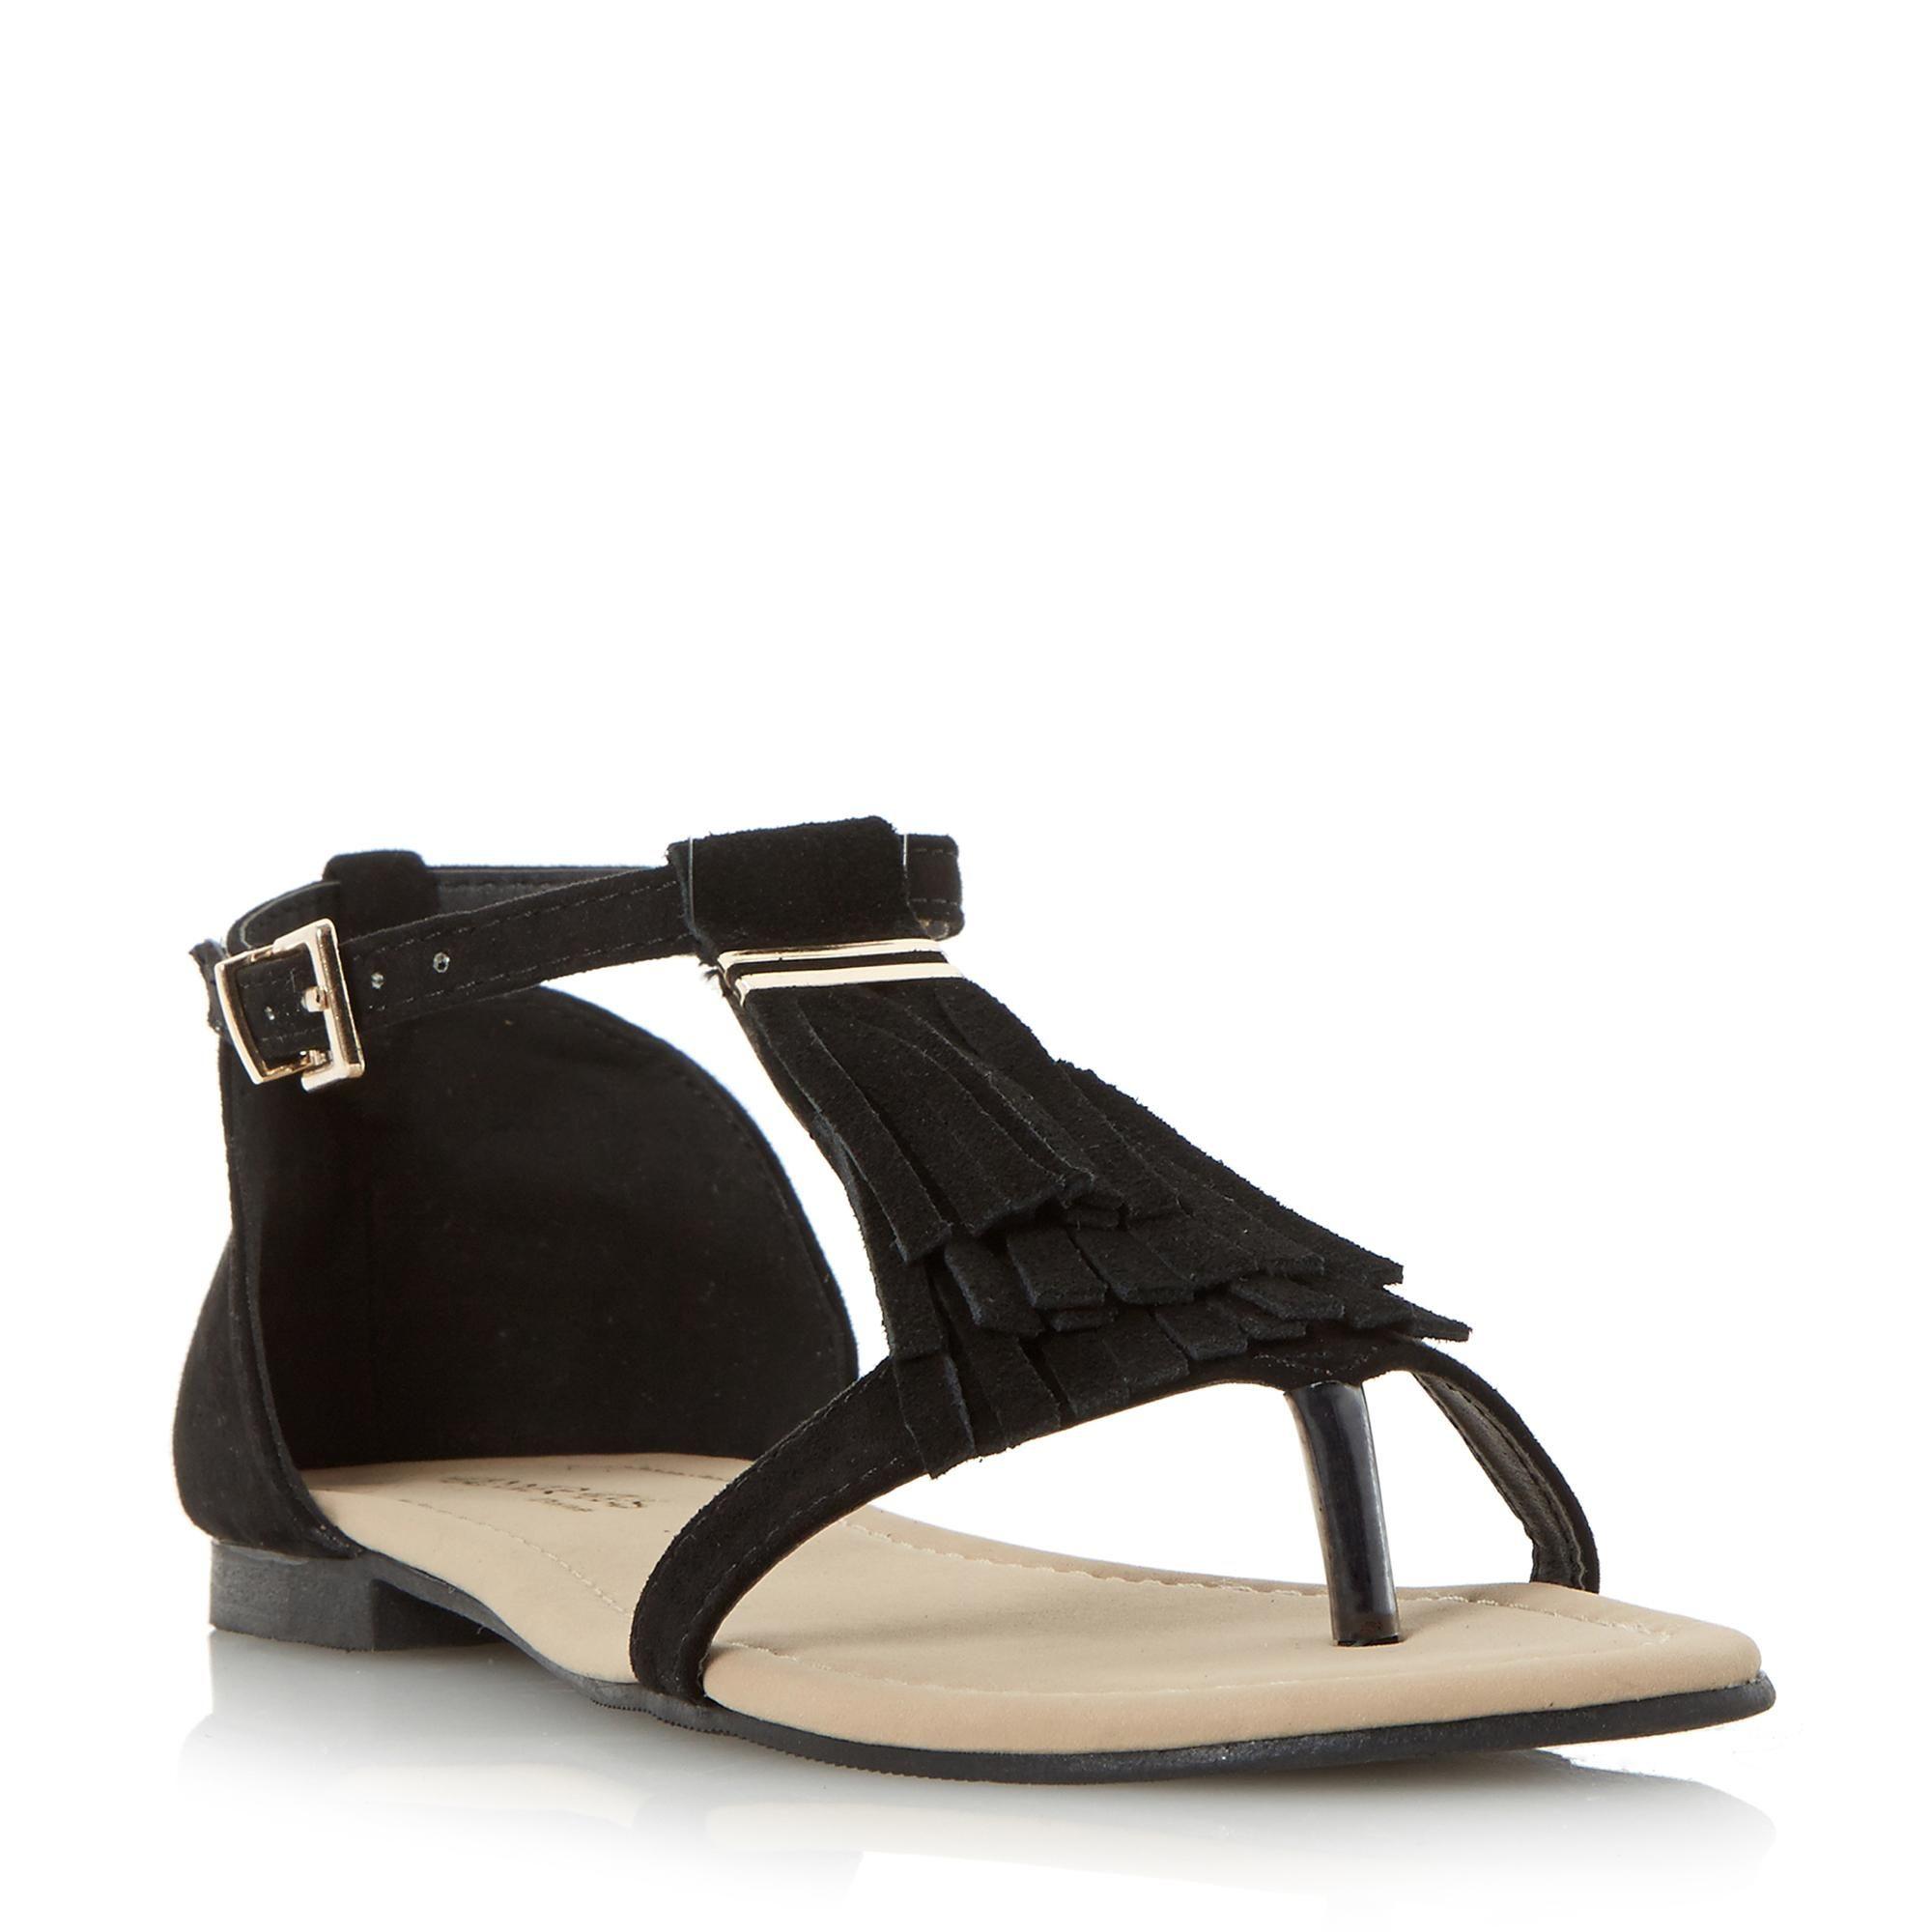 1eca6a8d023 Head Over Heels Ladies LAILAH - Fringe Toe Post Flat Sandal - black£25.00